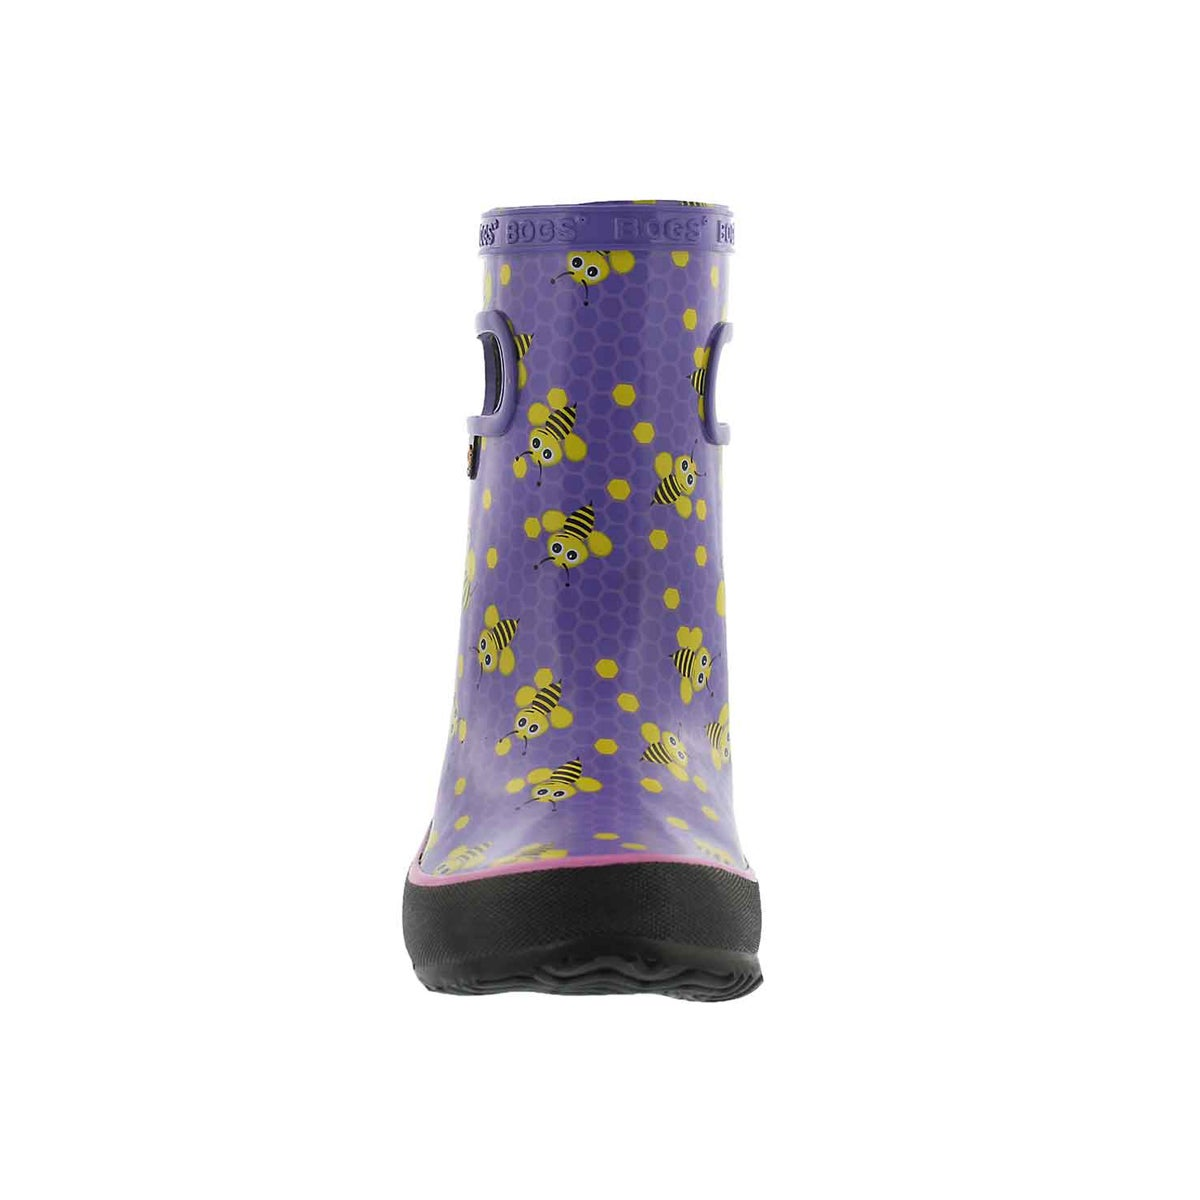 Inf-g Skipper Bees lvndr mlti rain boot